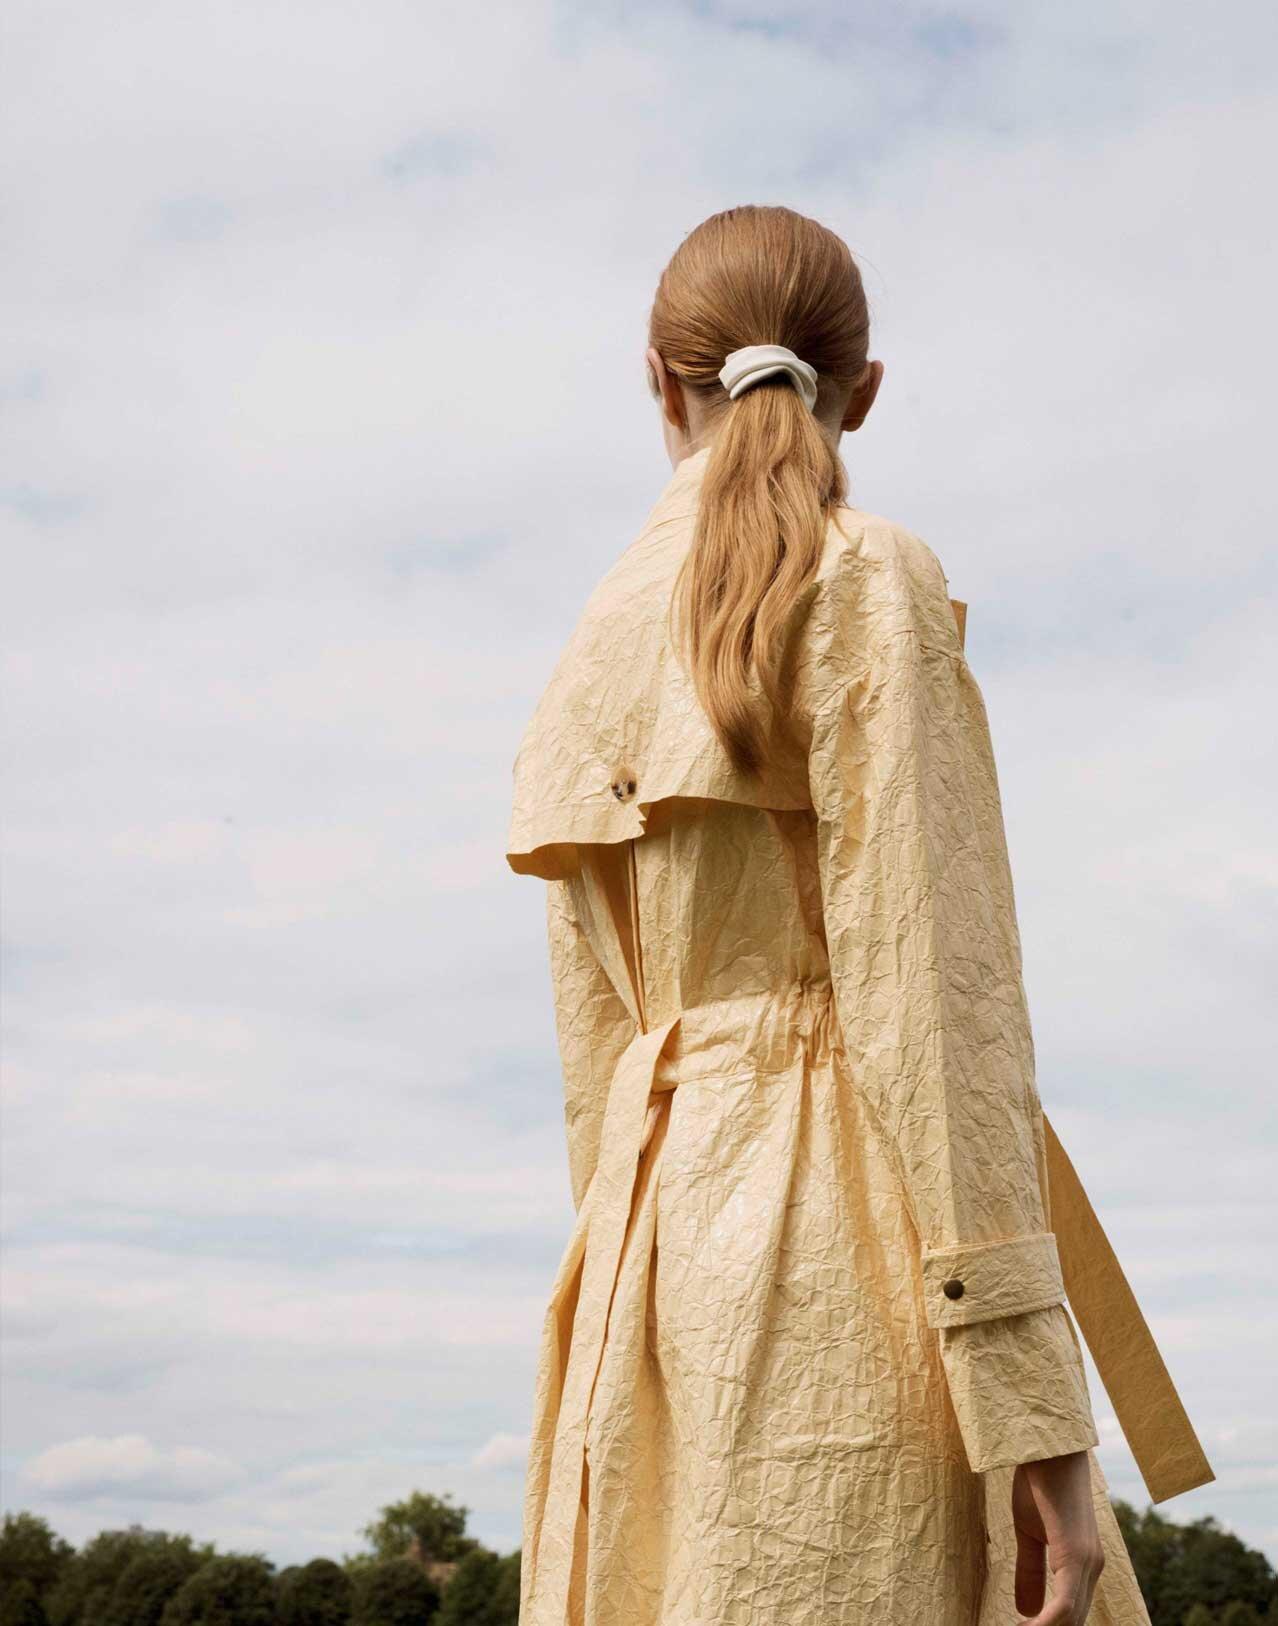 Completedworks-Gold-Vermeil-Hair-Barrette-Poolside-Gossip-11.jpg